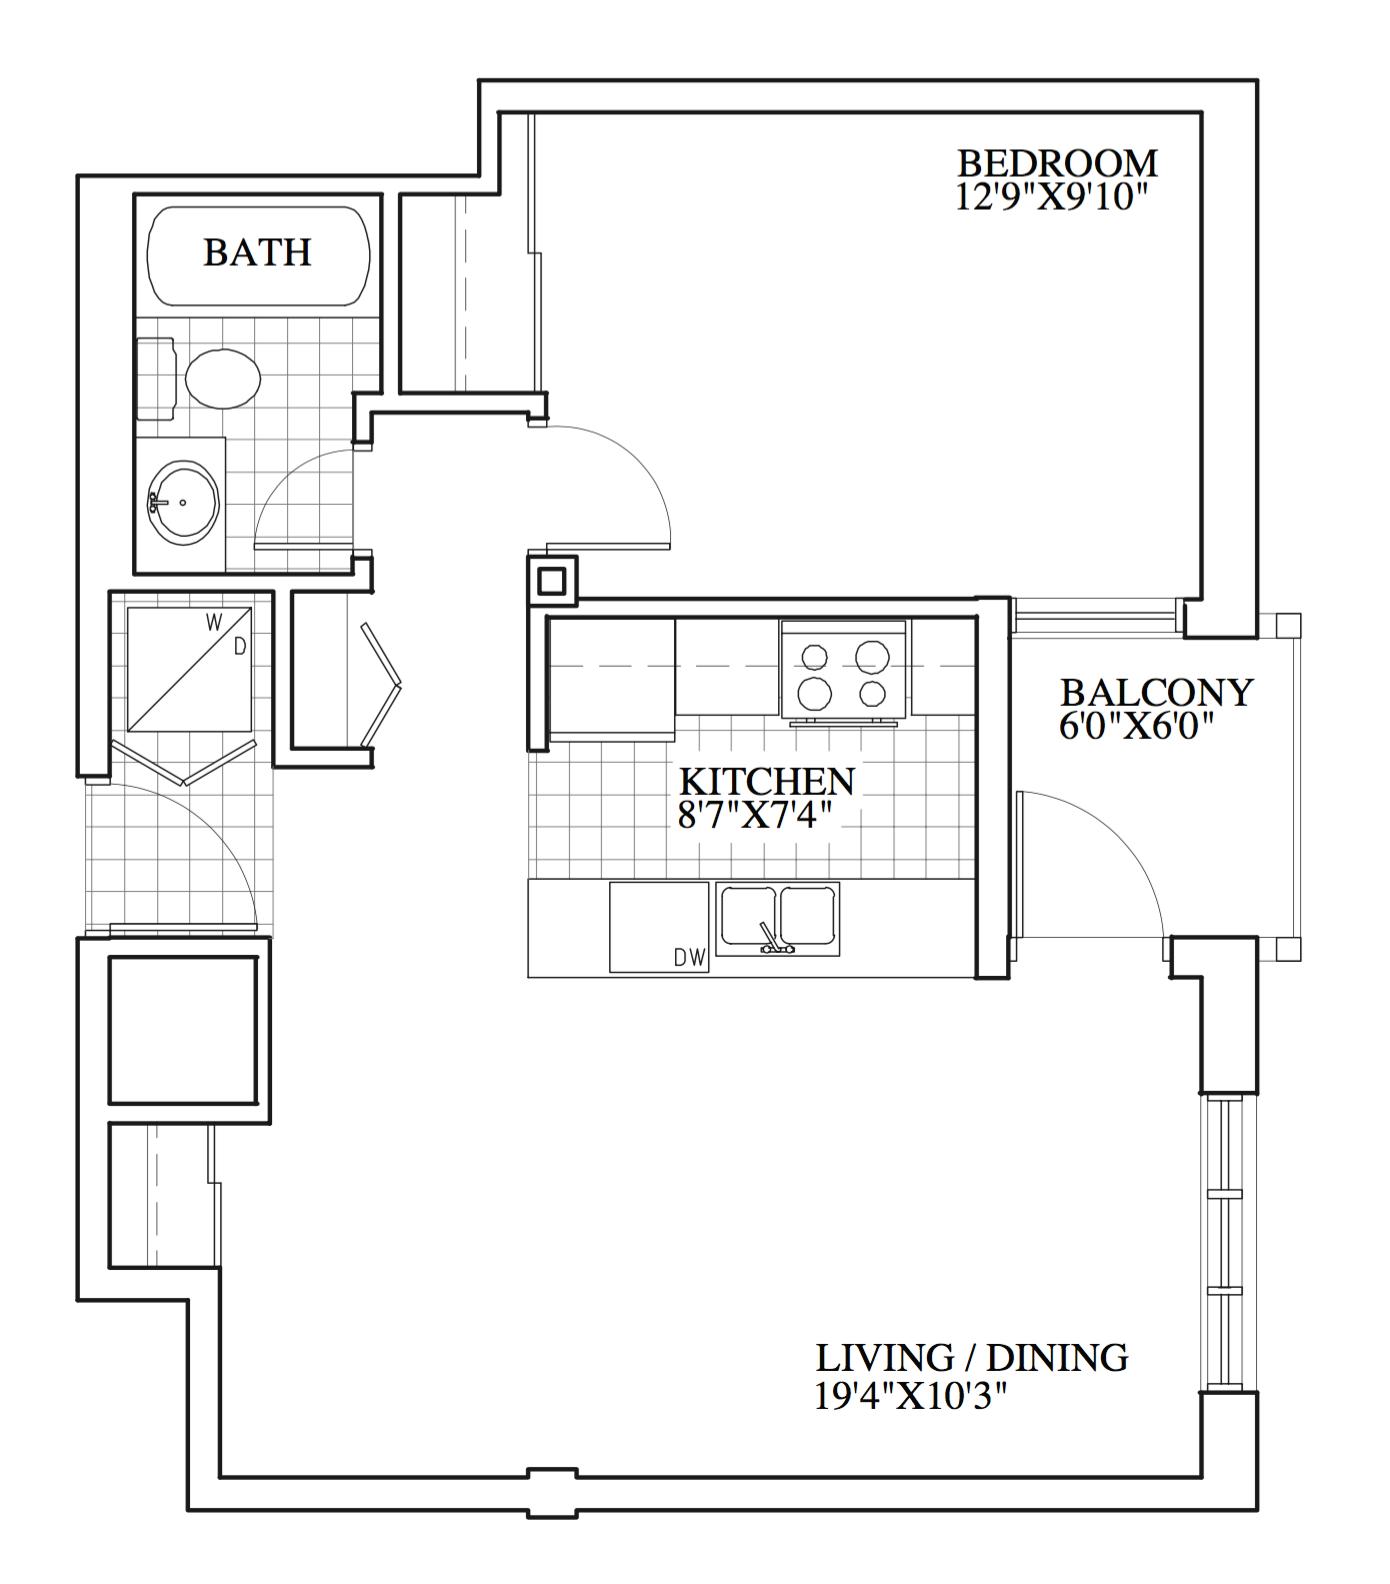 SOLD |Suite 203 | 620 sq ft